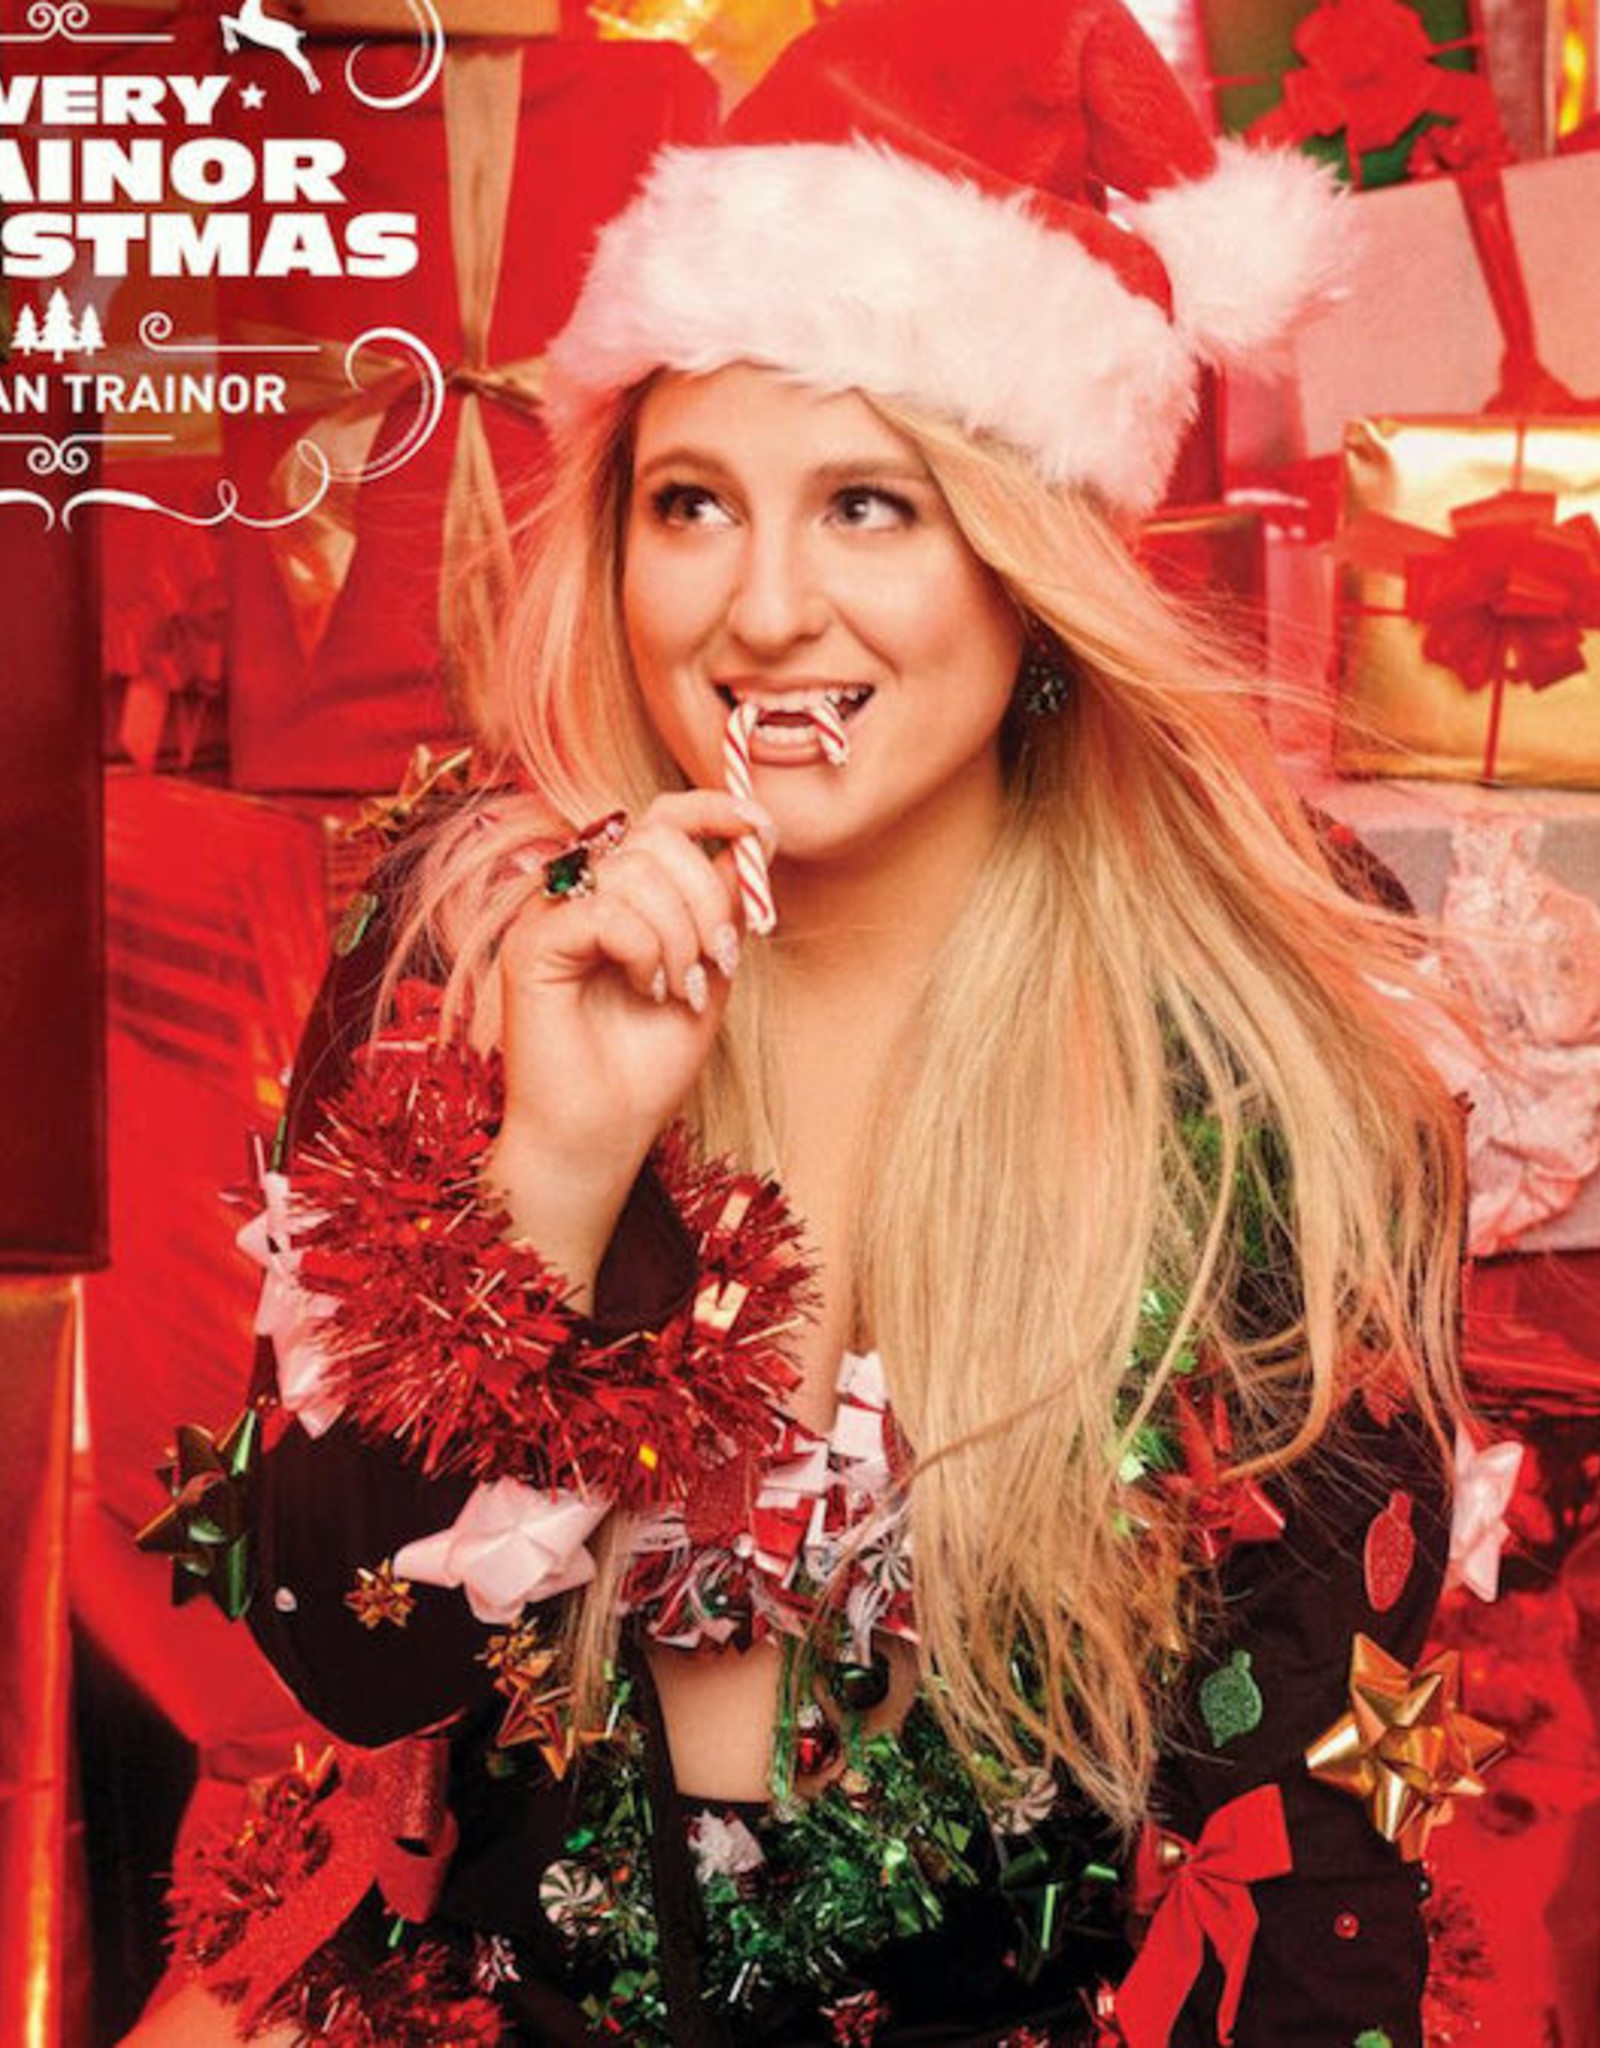 Meghan Trainor - A Very Trainor Christmas